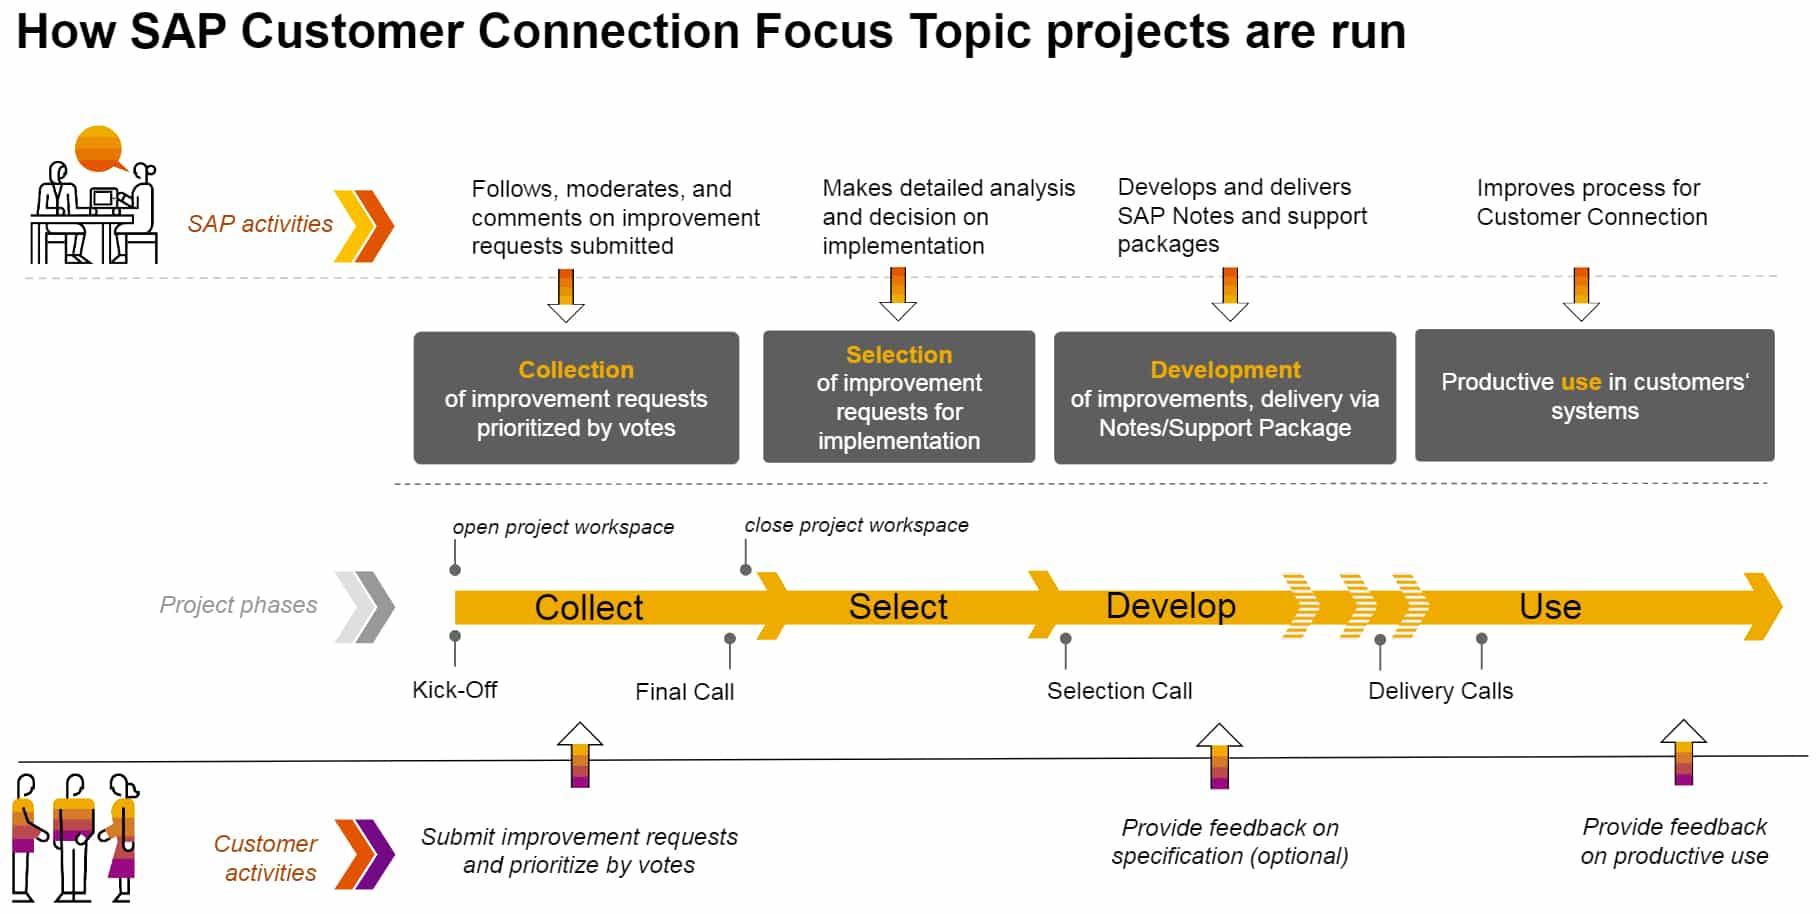 SAP Customer Connection